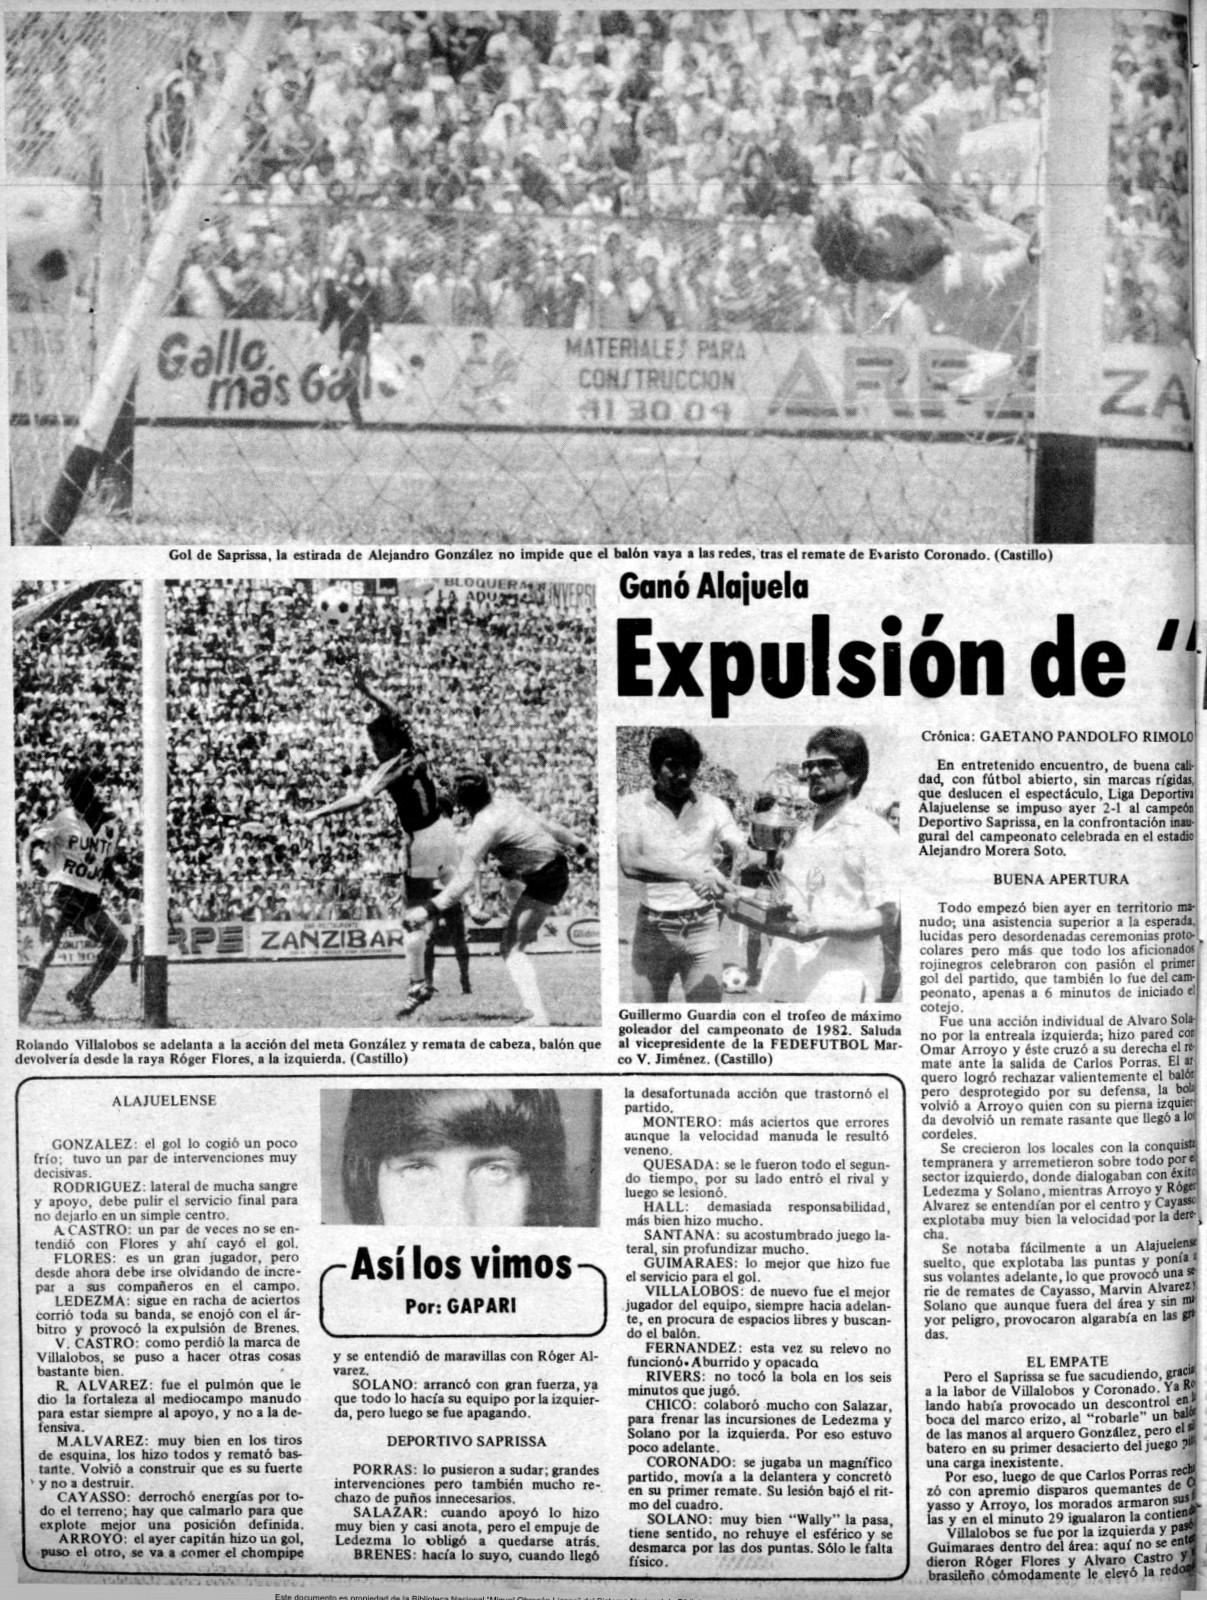 27 de febrero 1983